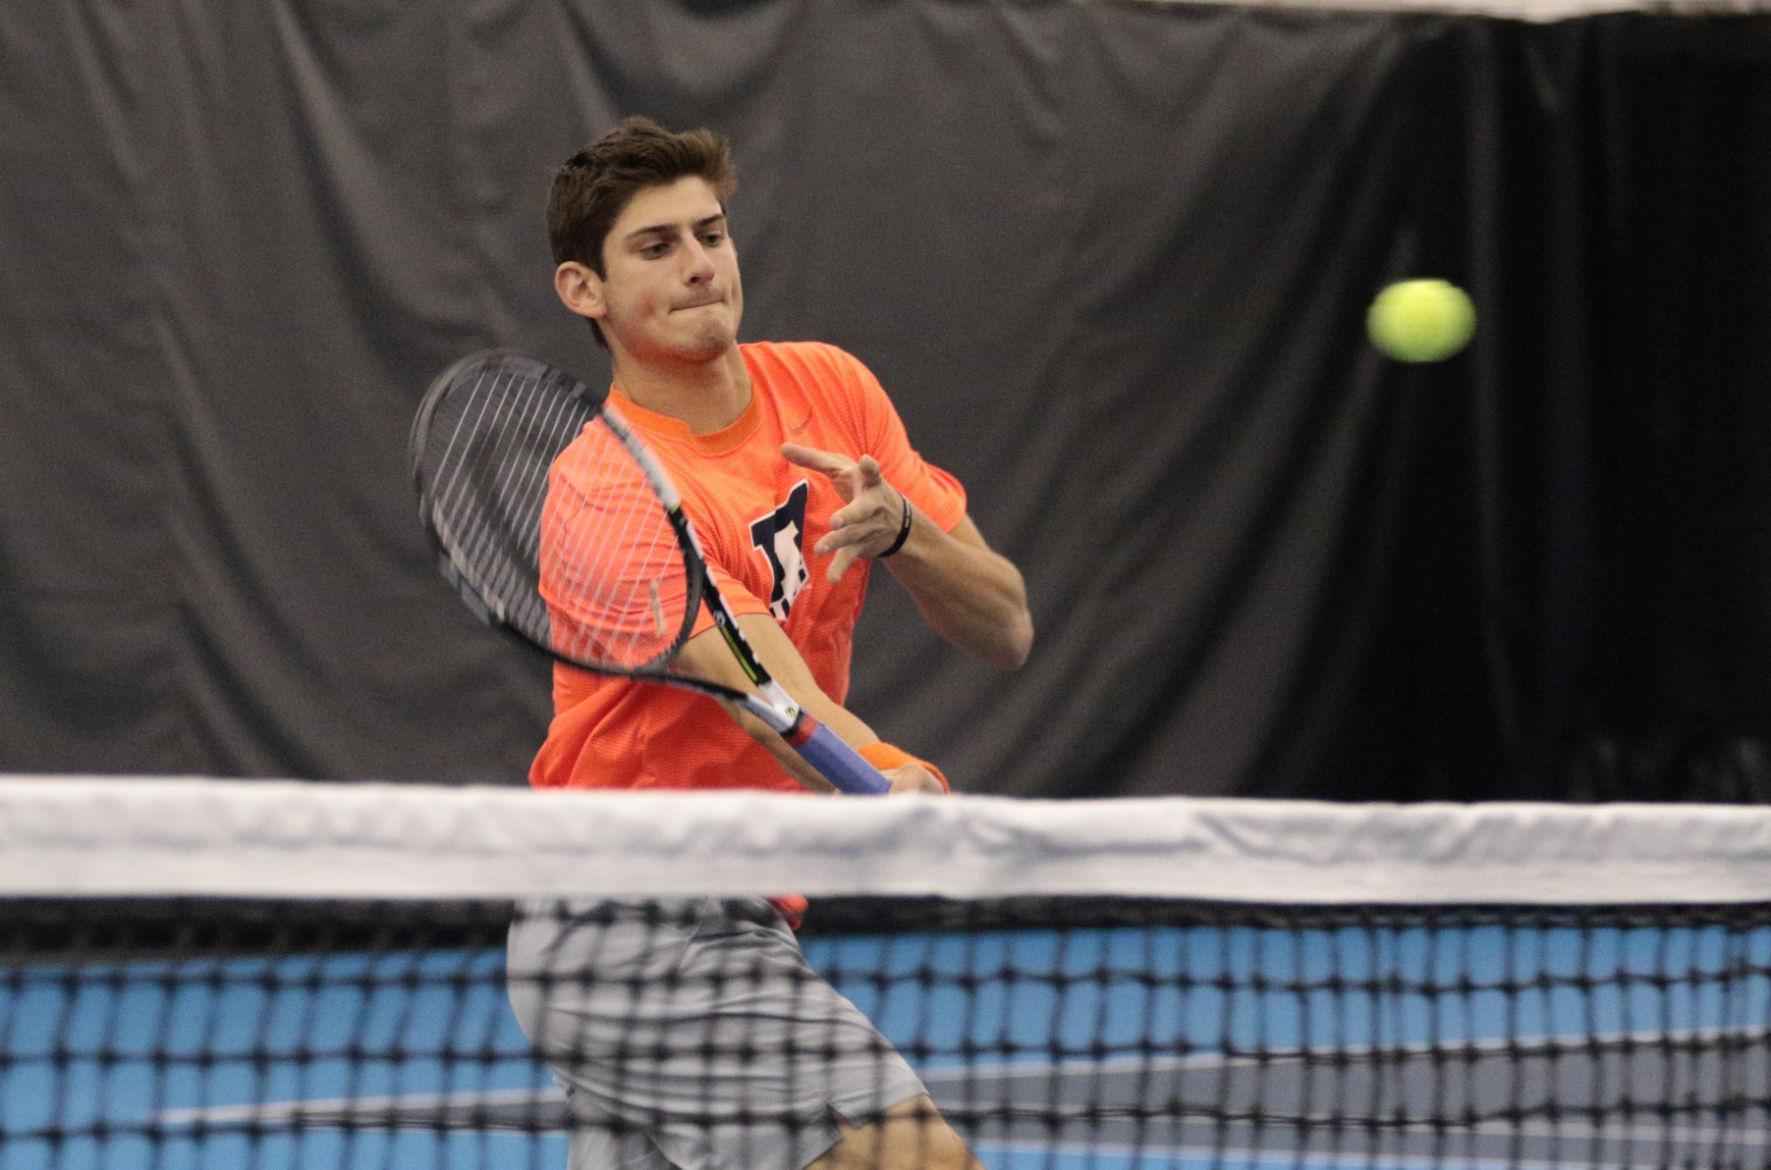 Illinois' Jared Hiltzik makes a short return during the tennis game v. Northwestern at Atkins Tennis Center on Feb. 20. Illinois won 5-2.